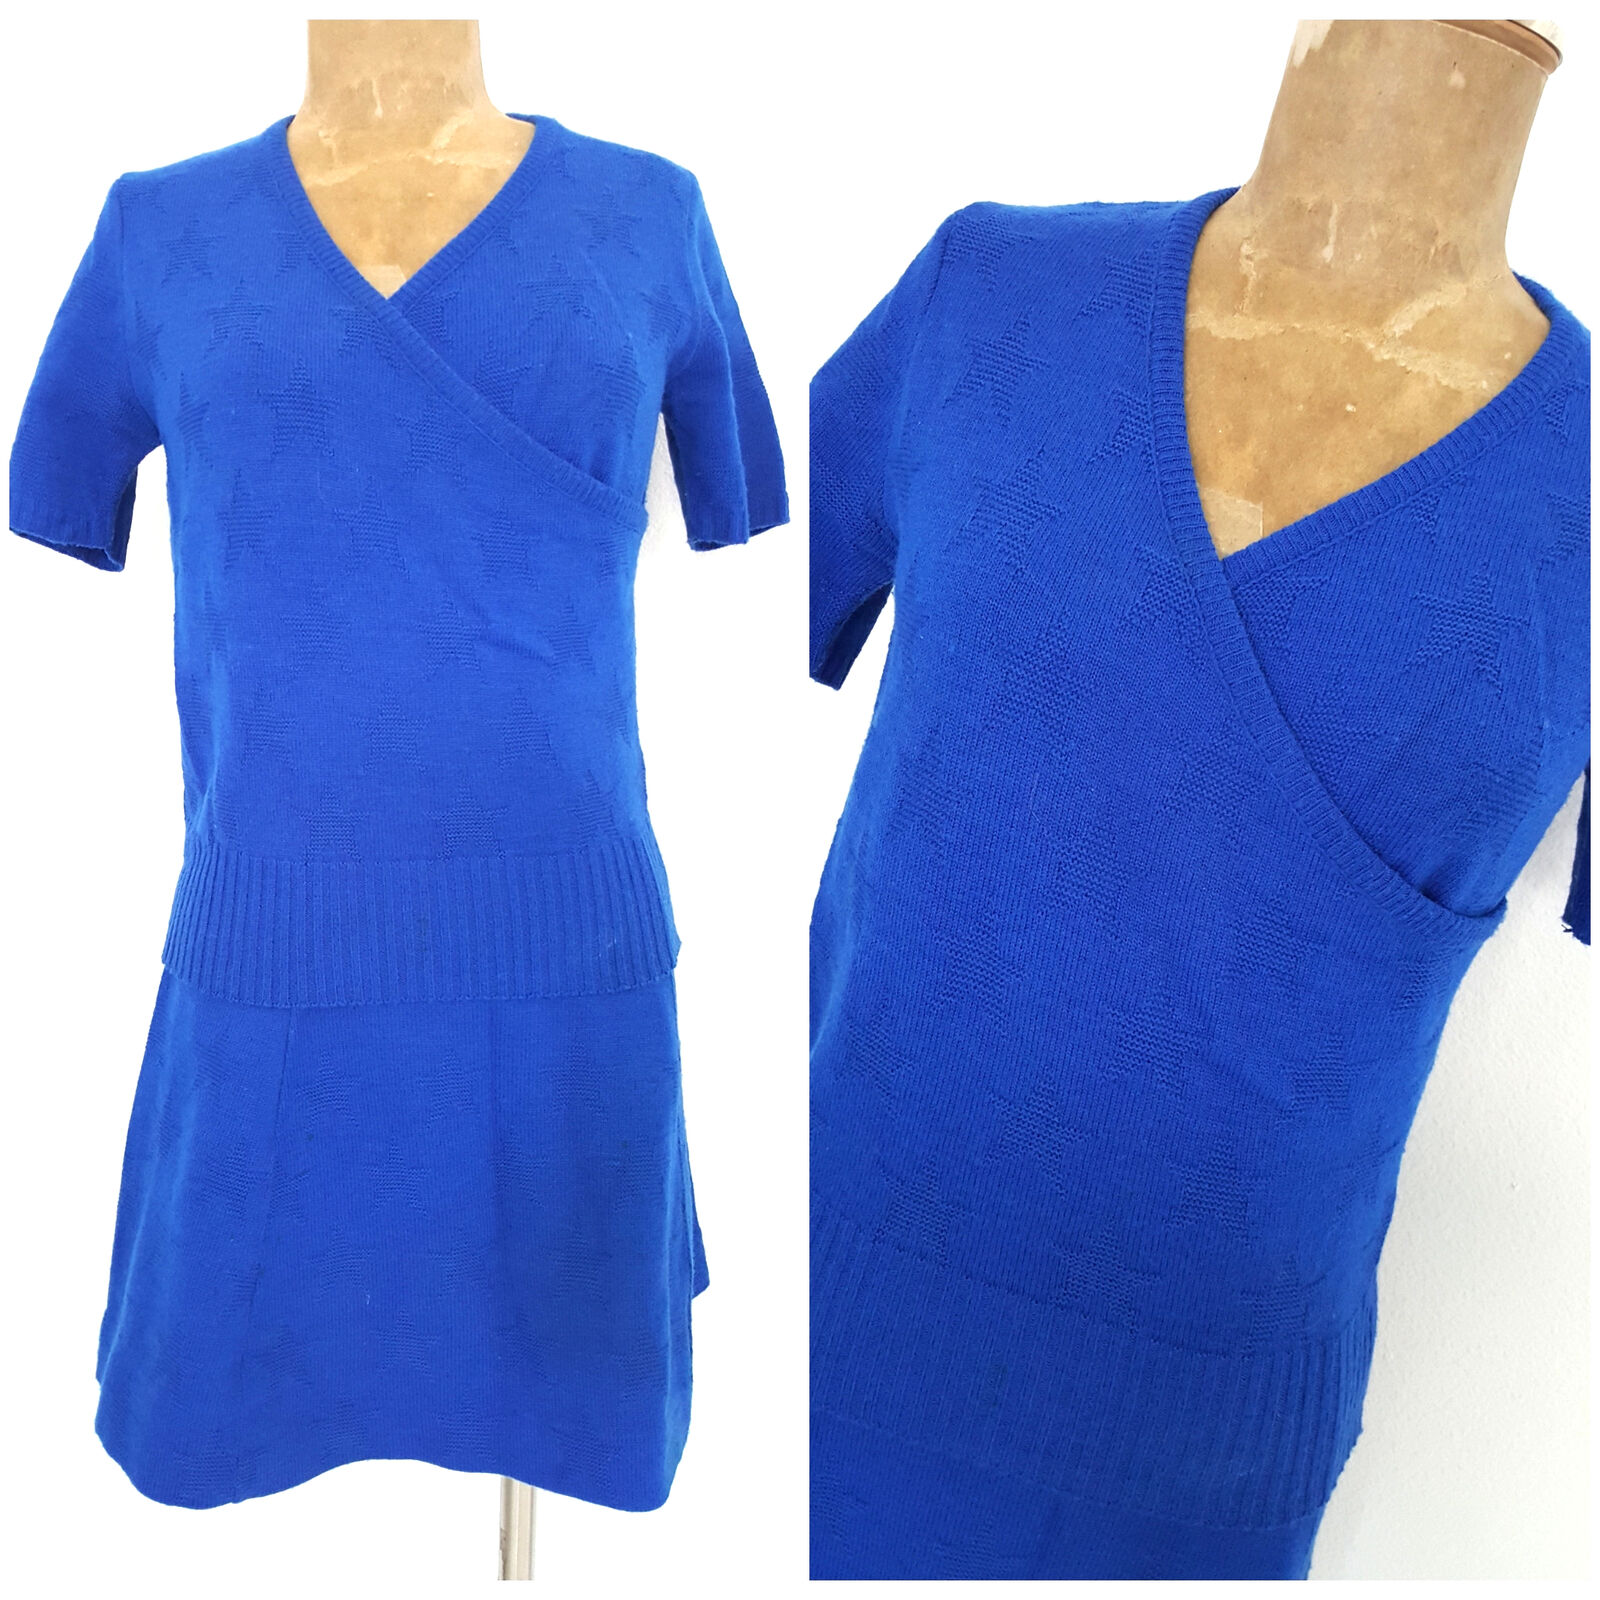 Vintage 70s Star Knit Sweater Dress Size Small bluee Mini Festive Retro JcPenney